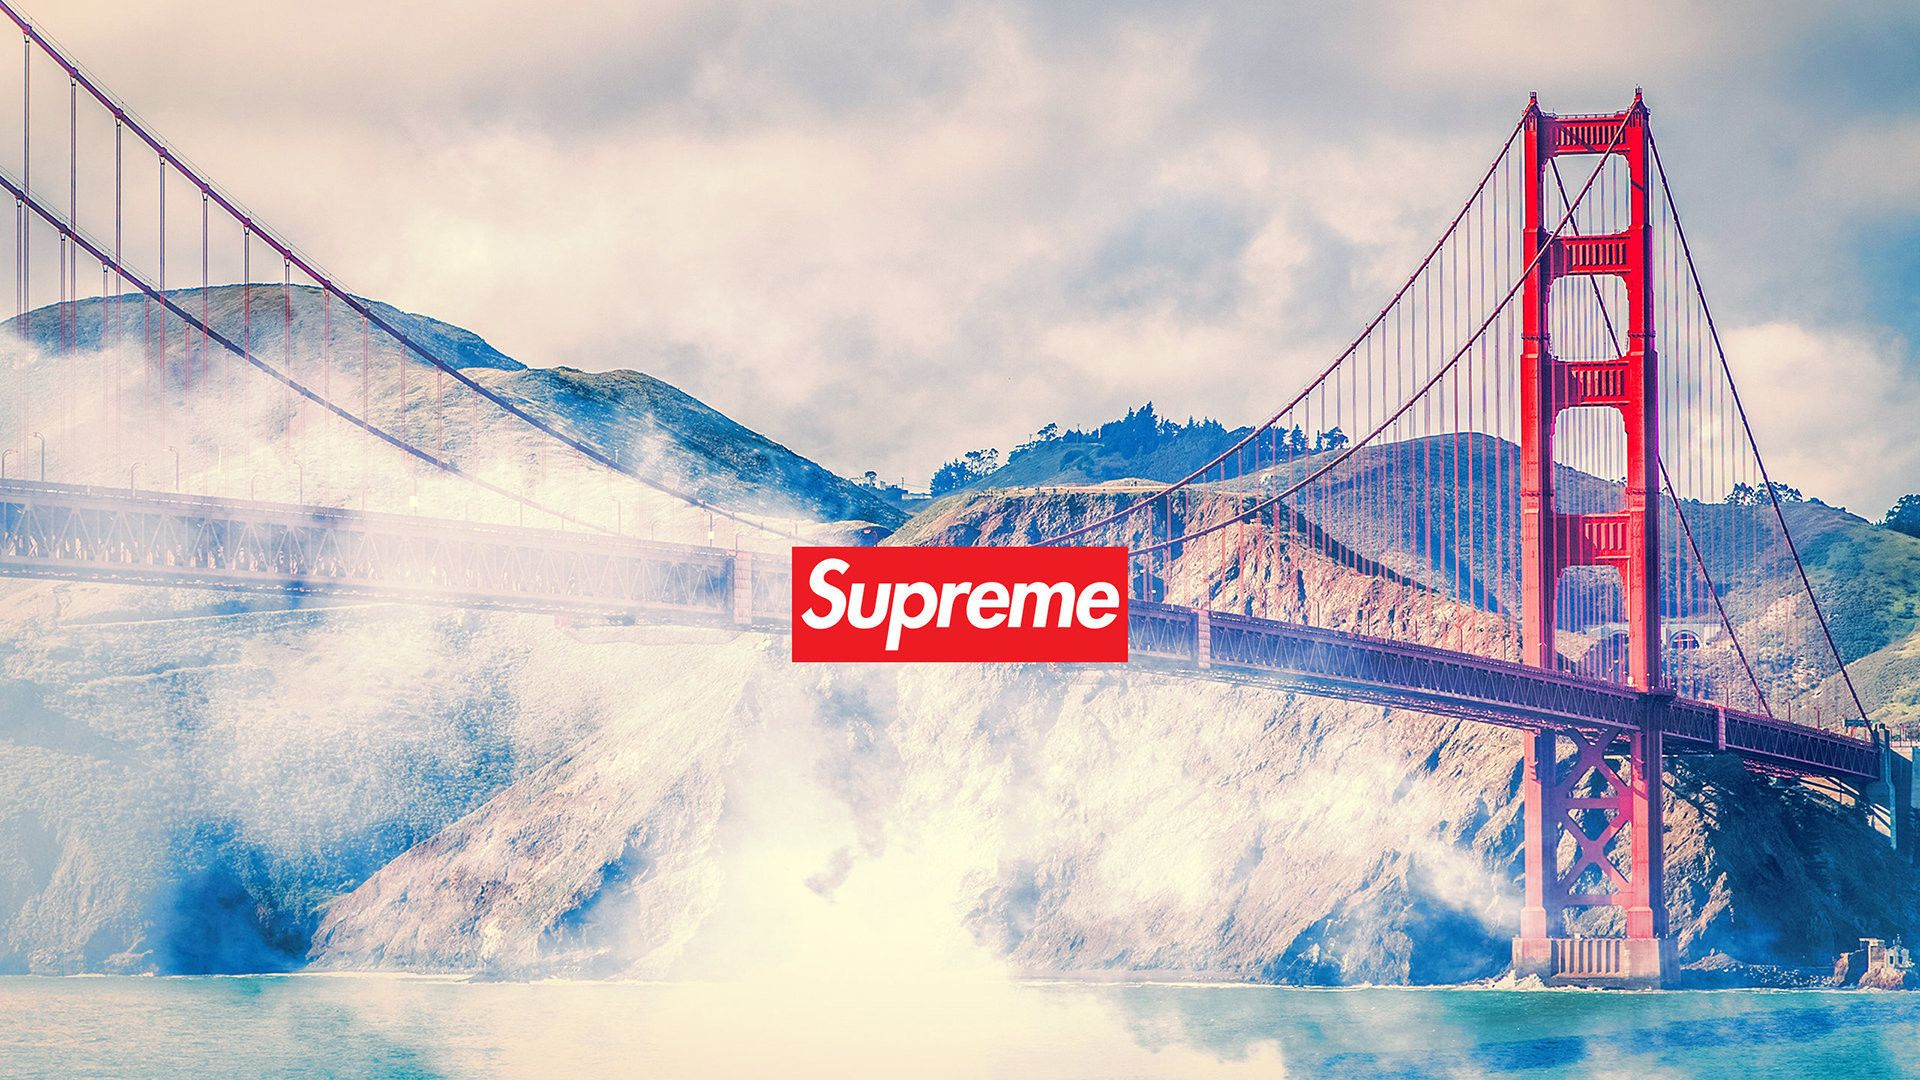 1920x1080 San Francisco Supreme Sneakerheads in 2019 Supreme 1920x1080